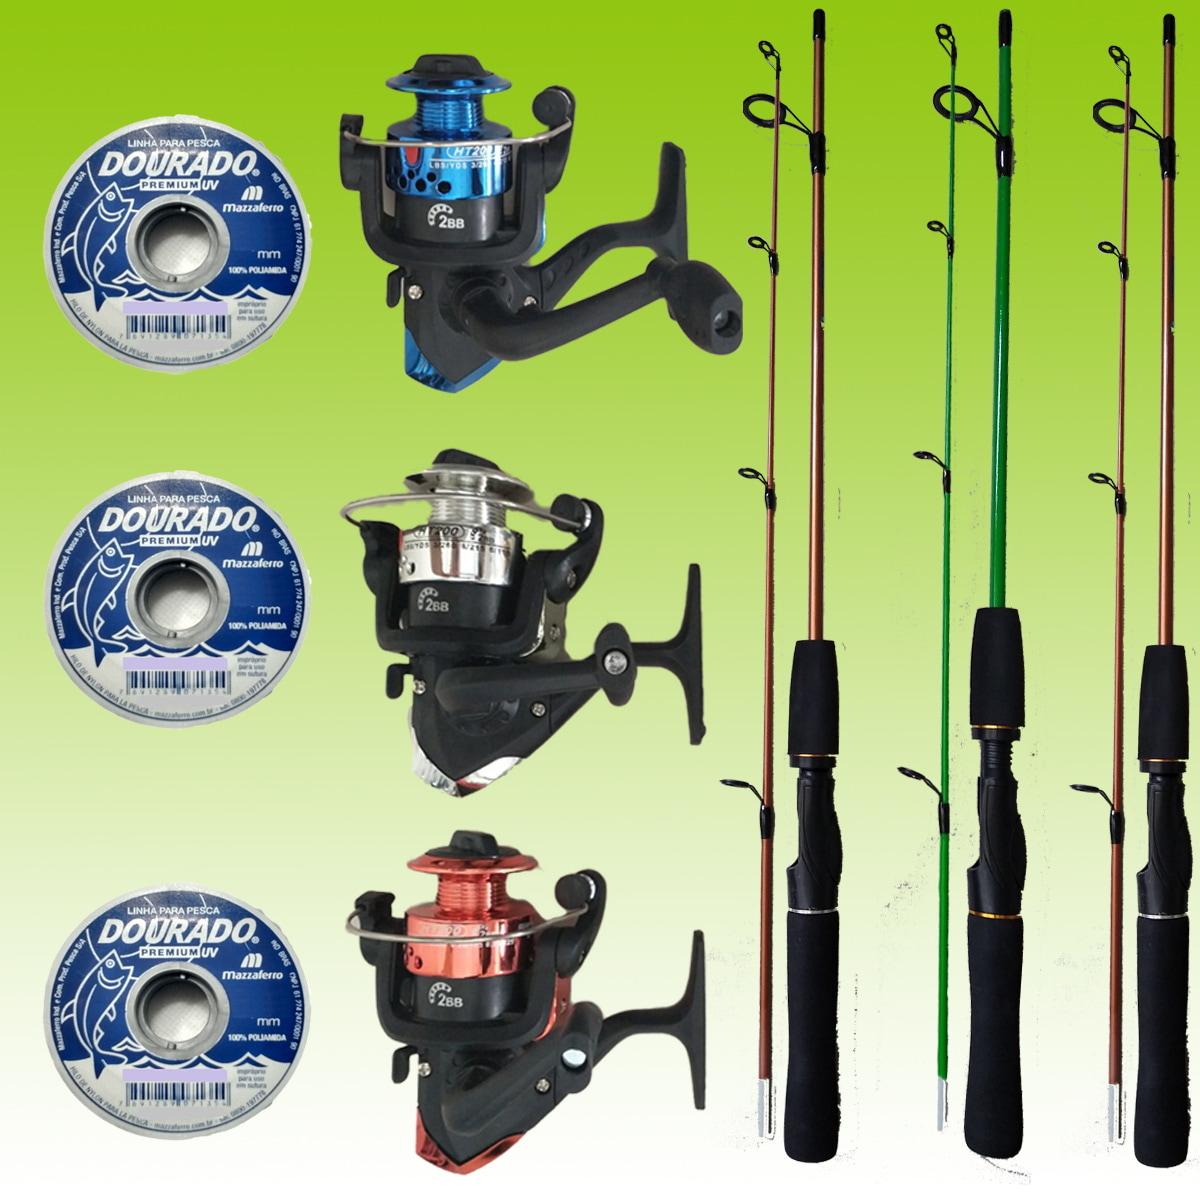 Kit De Pesca 3 Varas 1,20m 3 Molinetes C/ Linha Barato